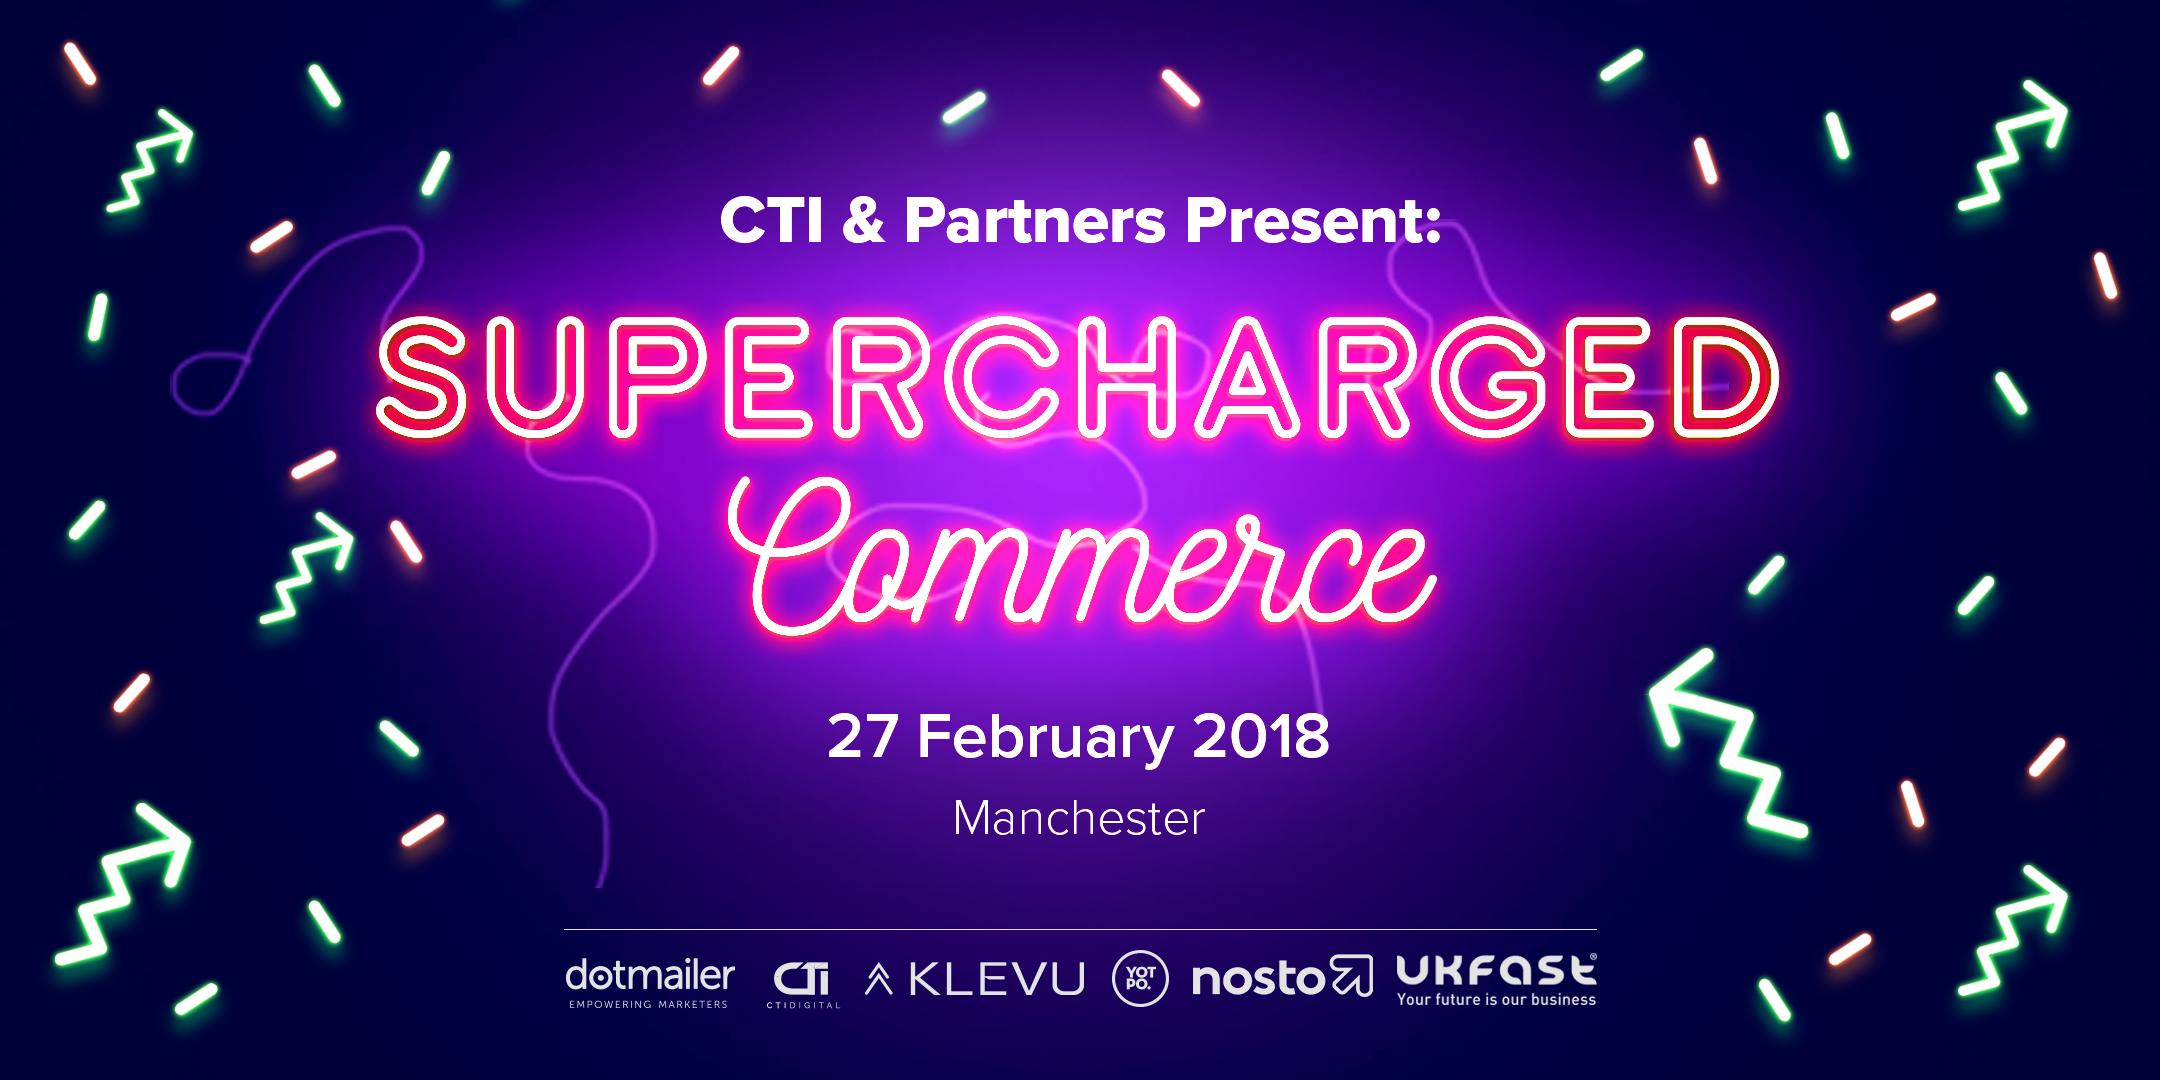 Superchargent_Commerce_Event_2018